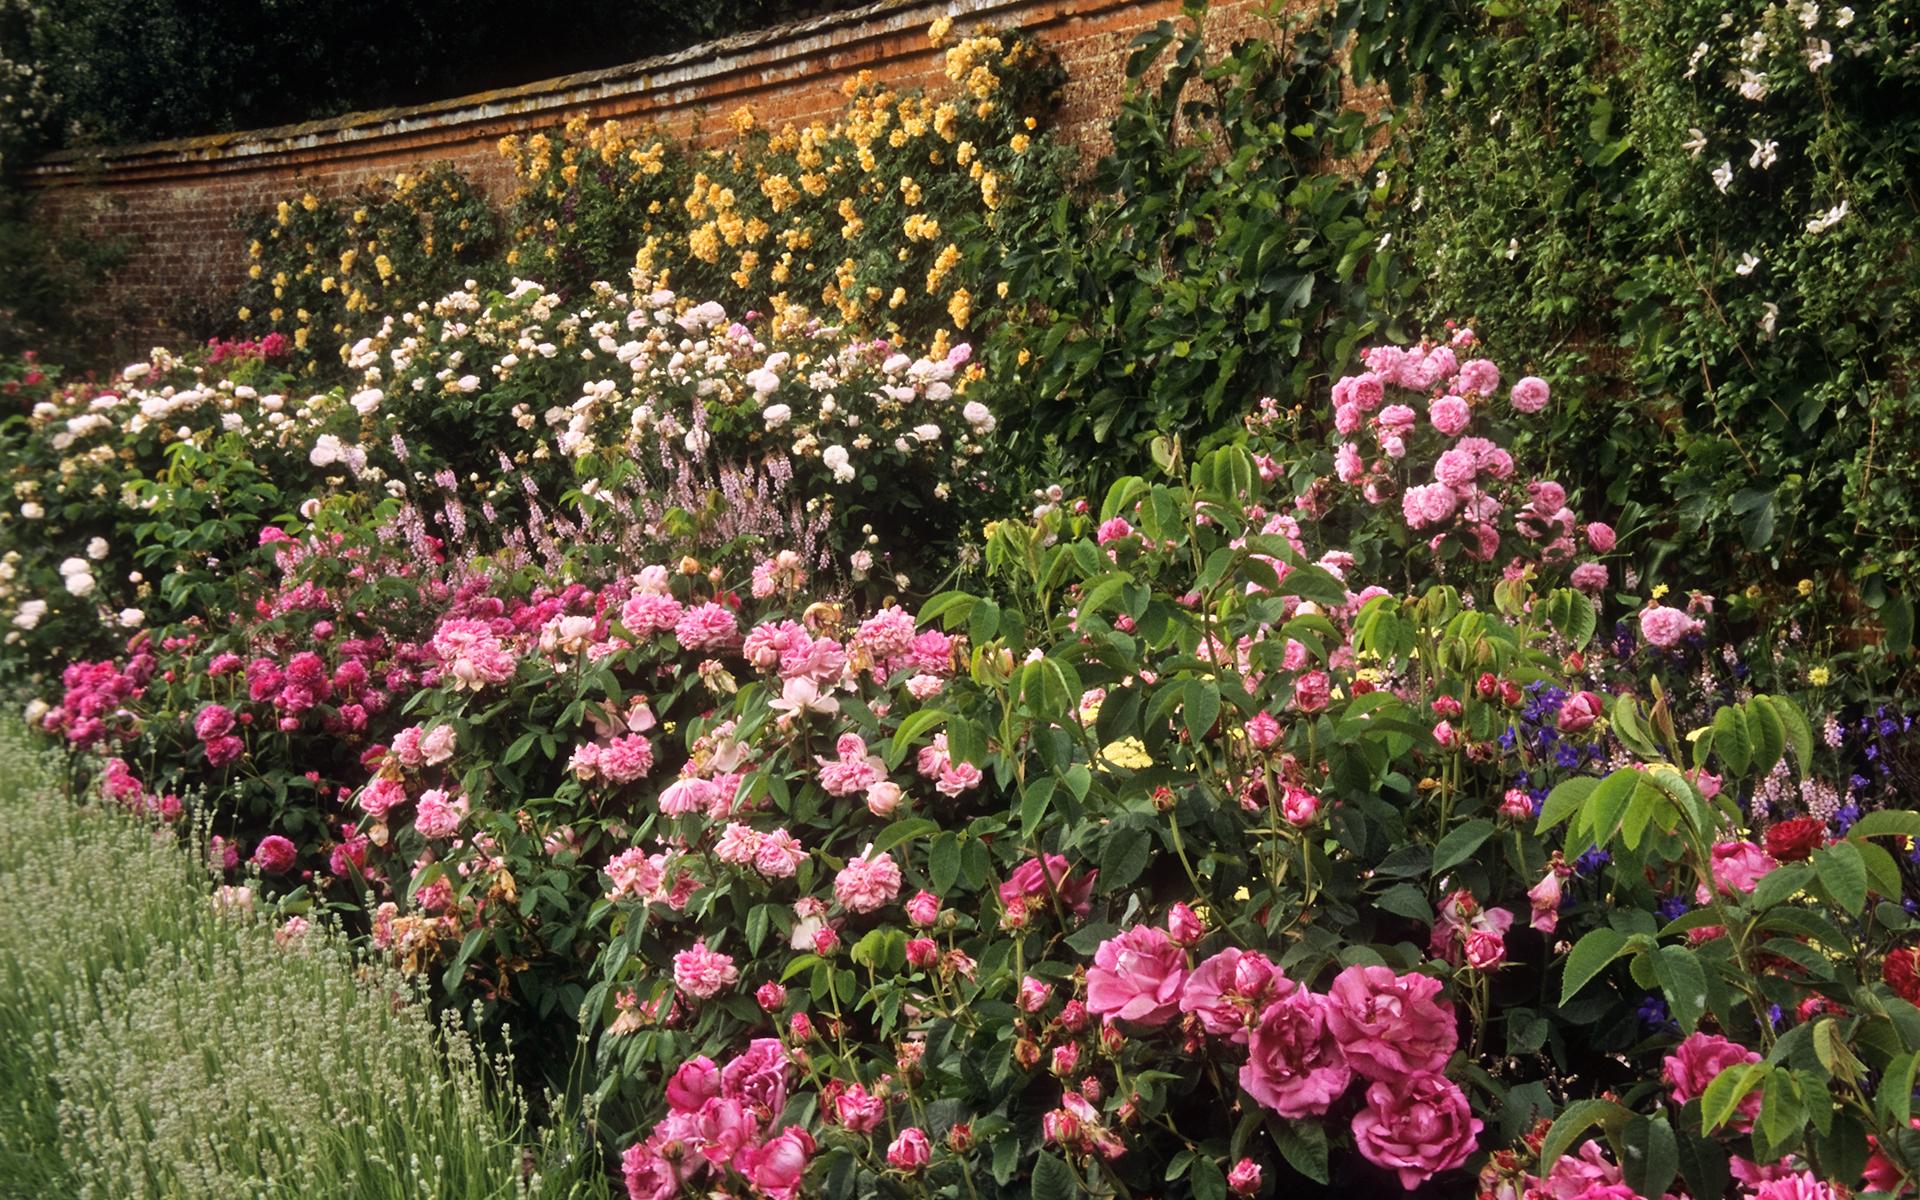 Roses In Garden: Mottisfont Abbey Garden, Hampshire, UK